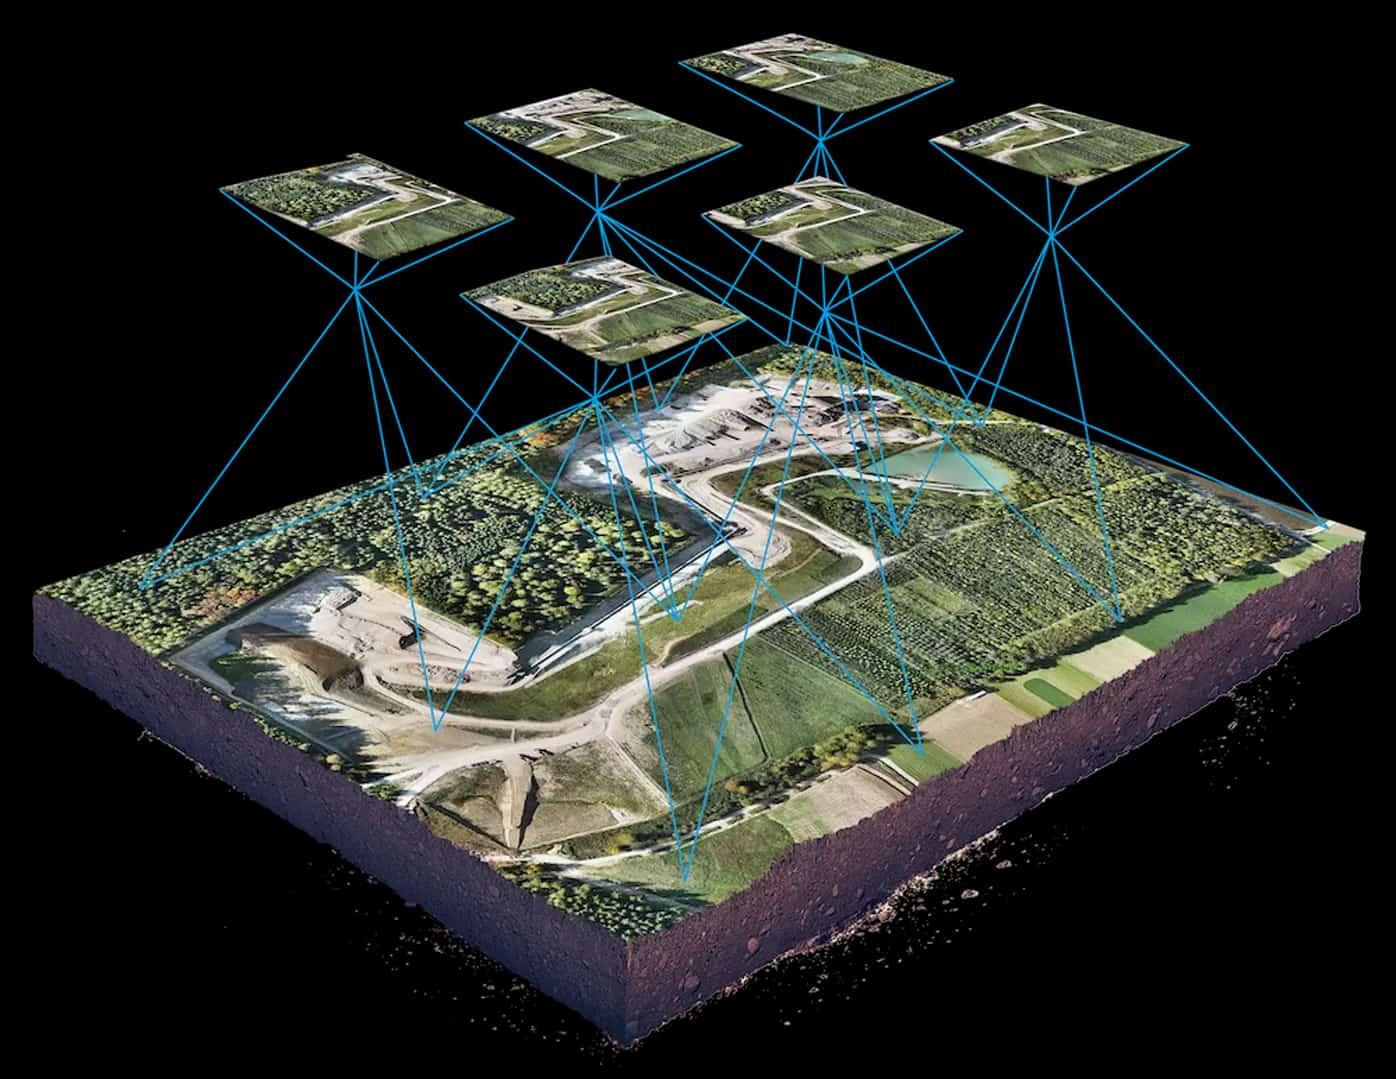 3D image explaining how photogrammetry works